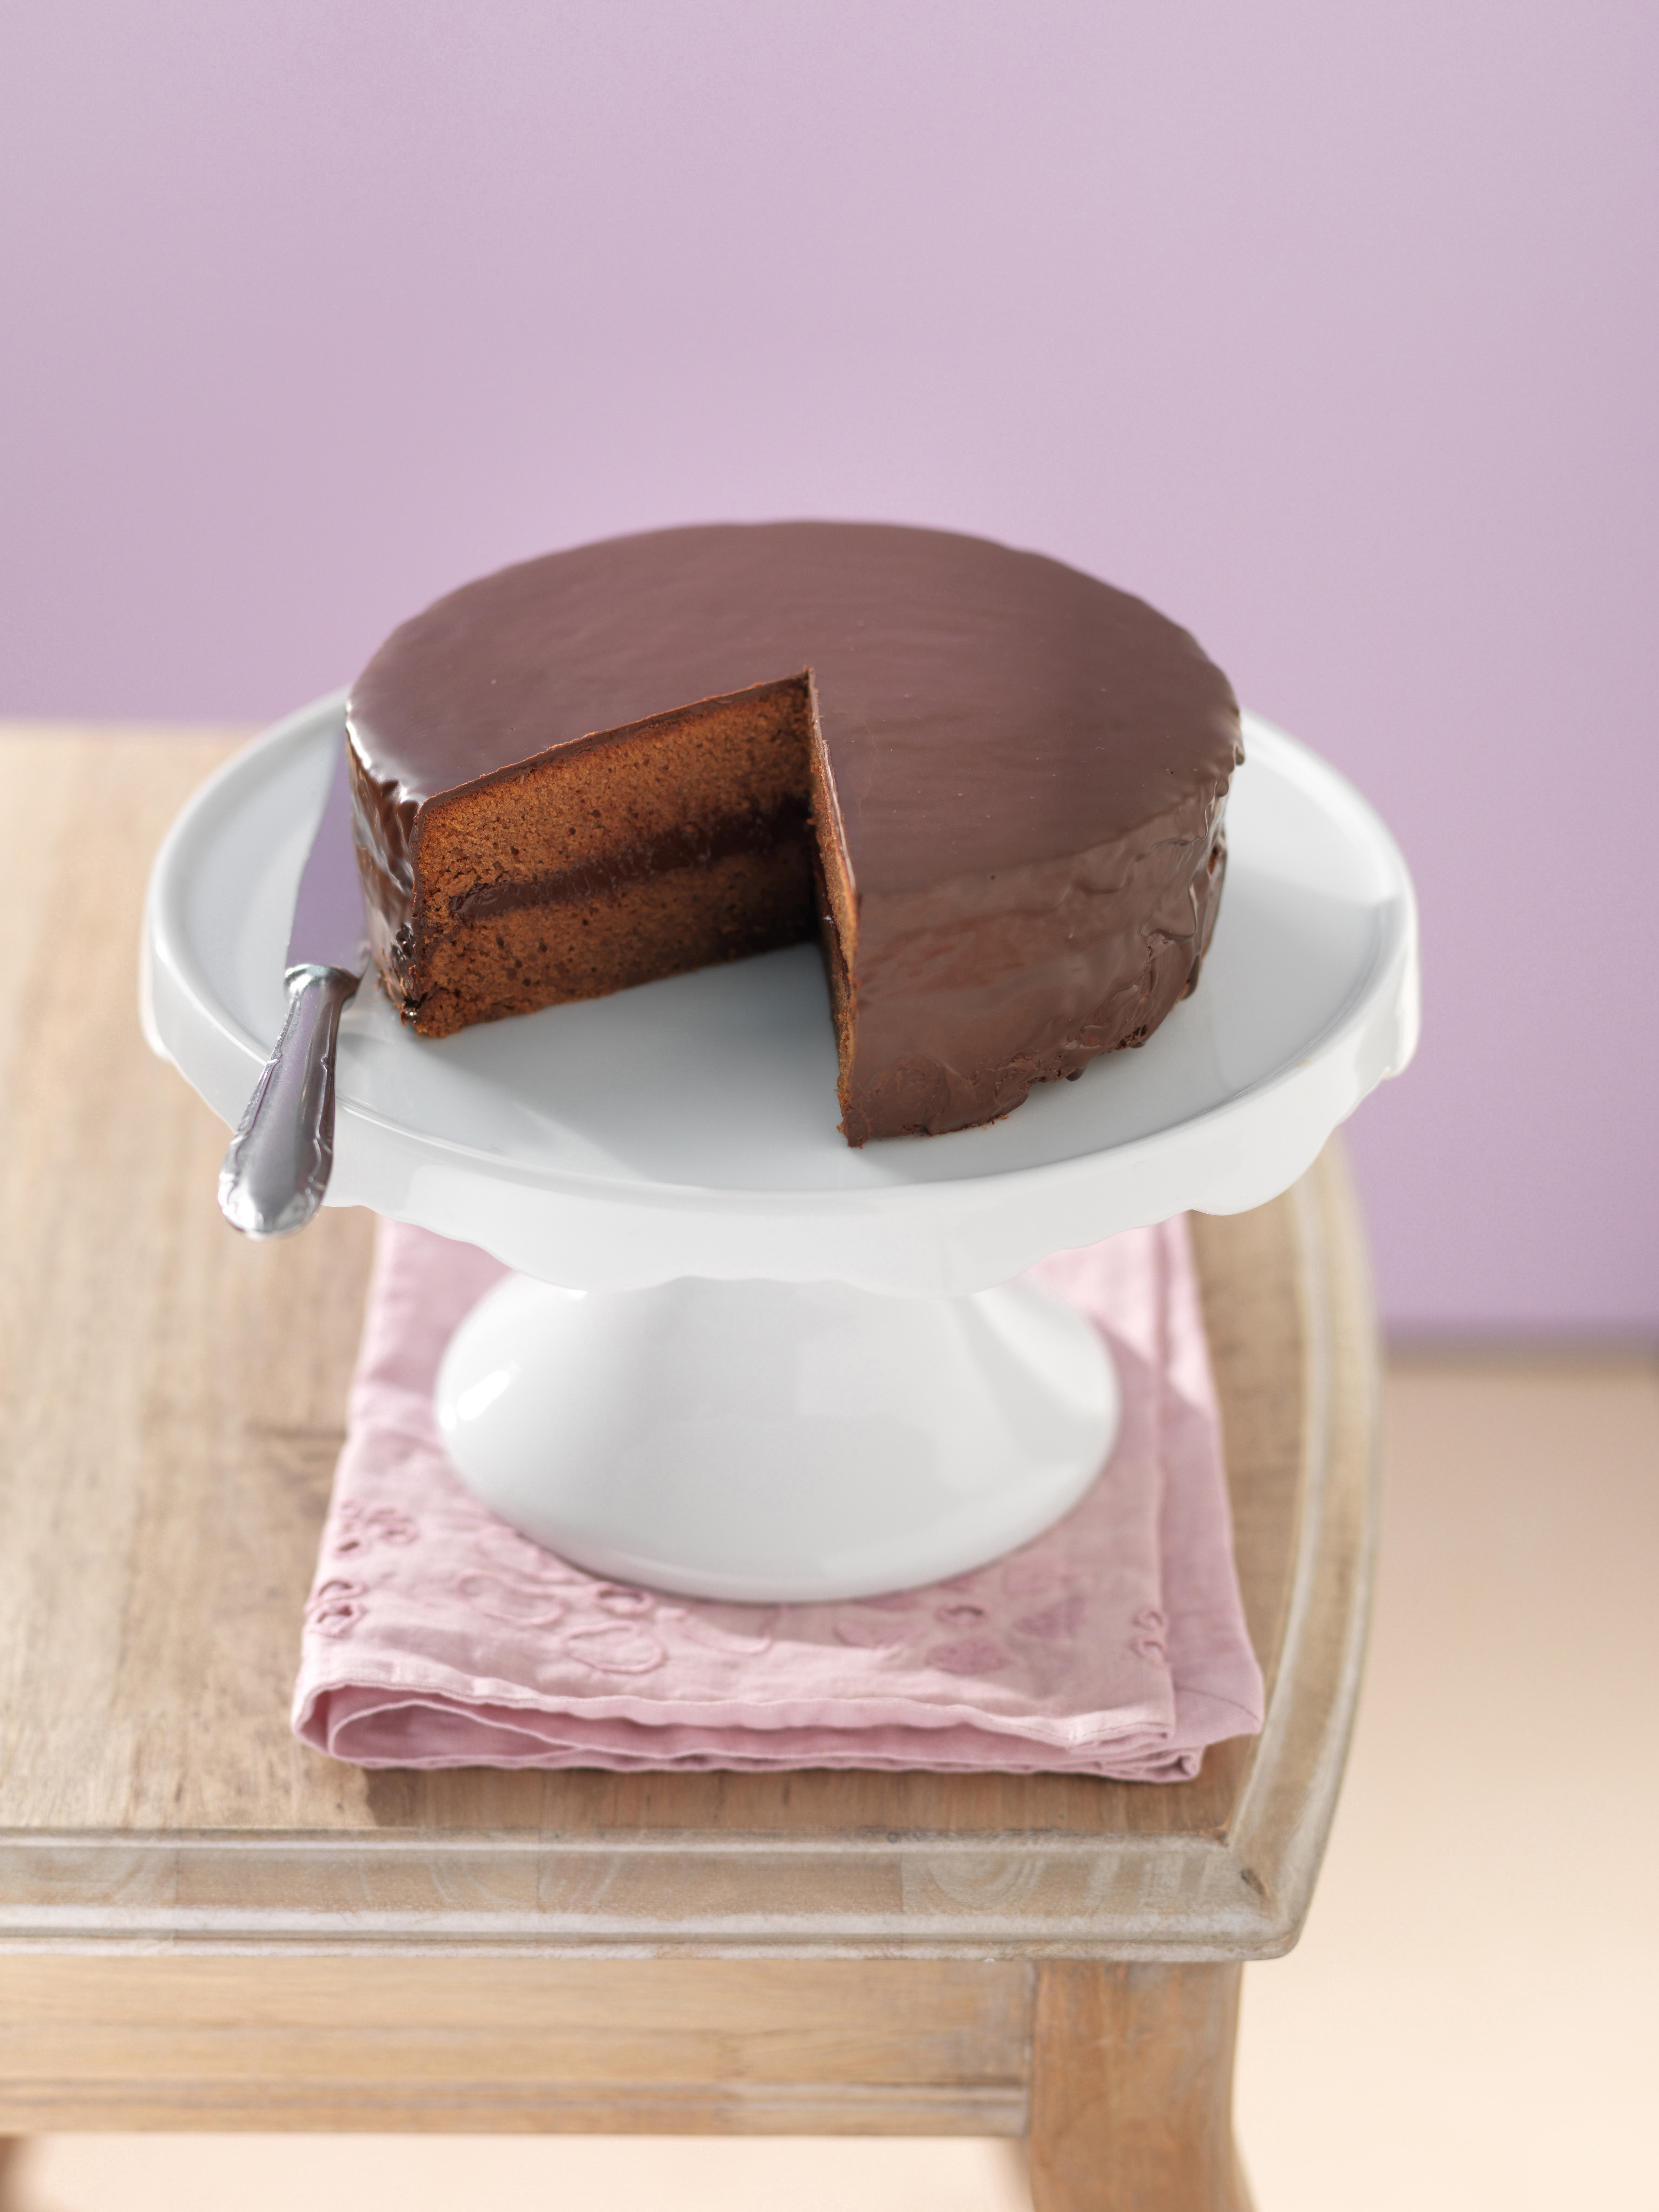 torta gianduja di Torino ricetta